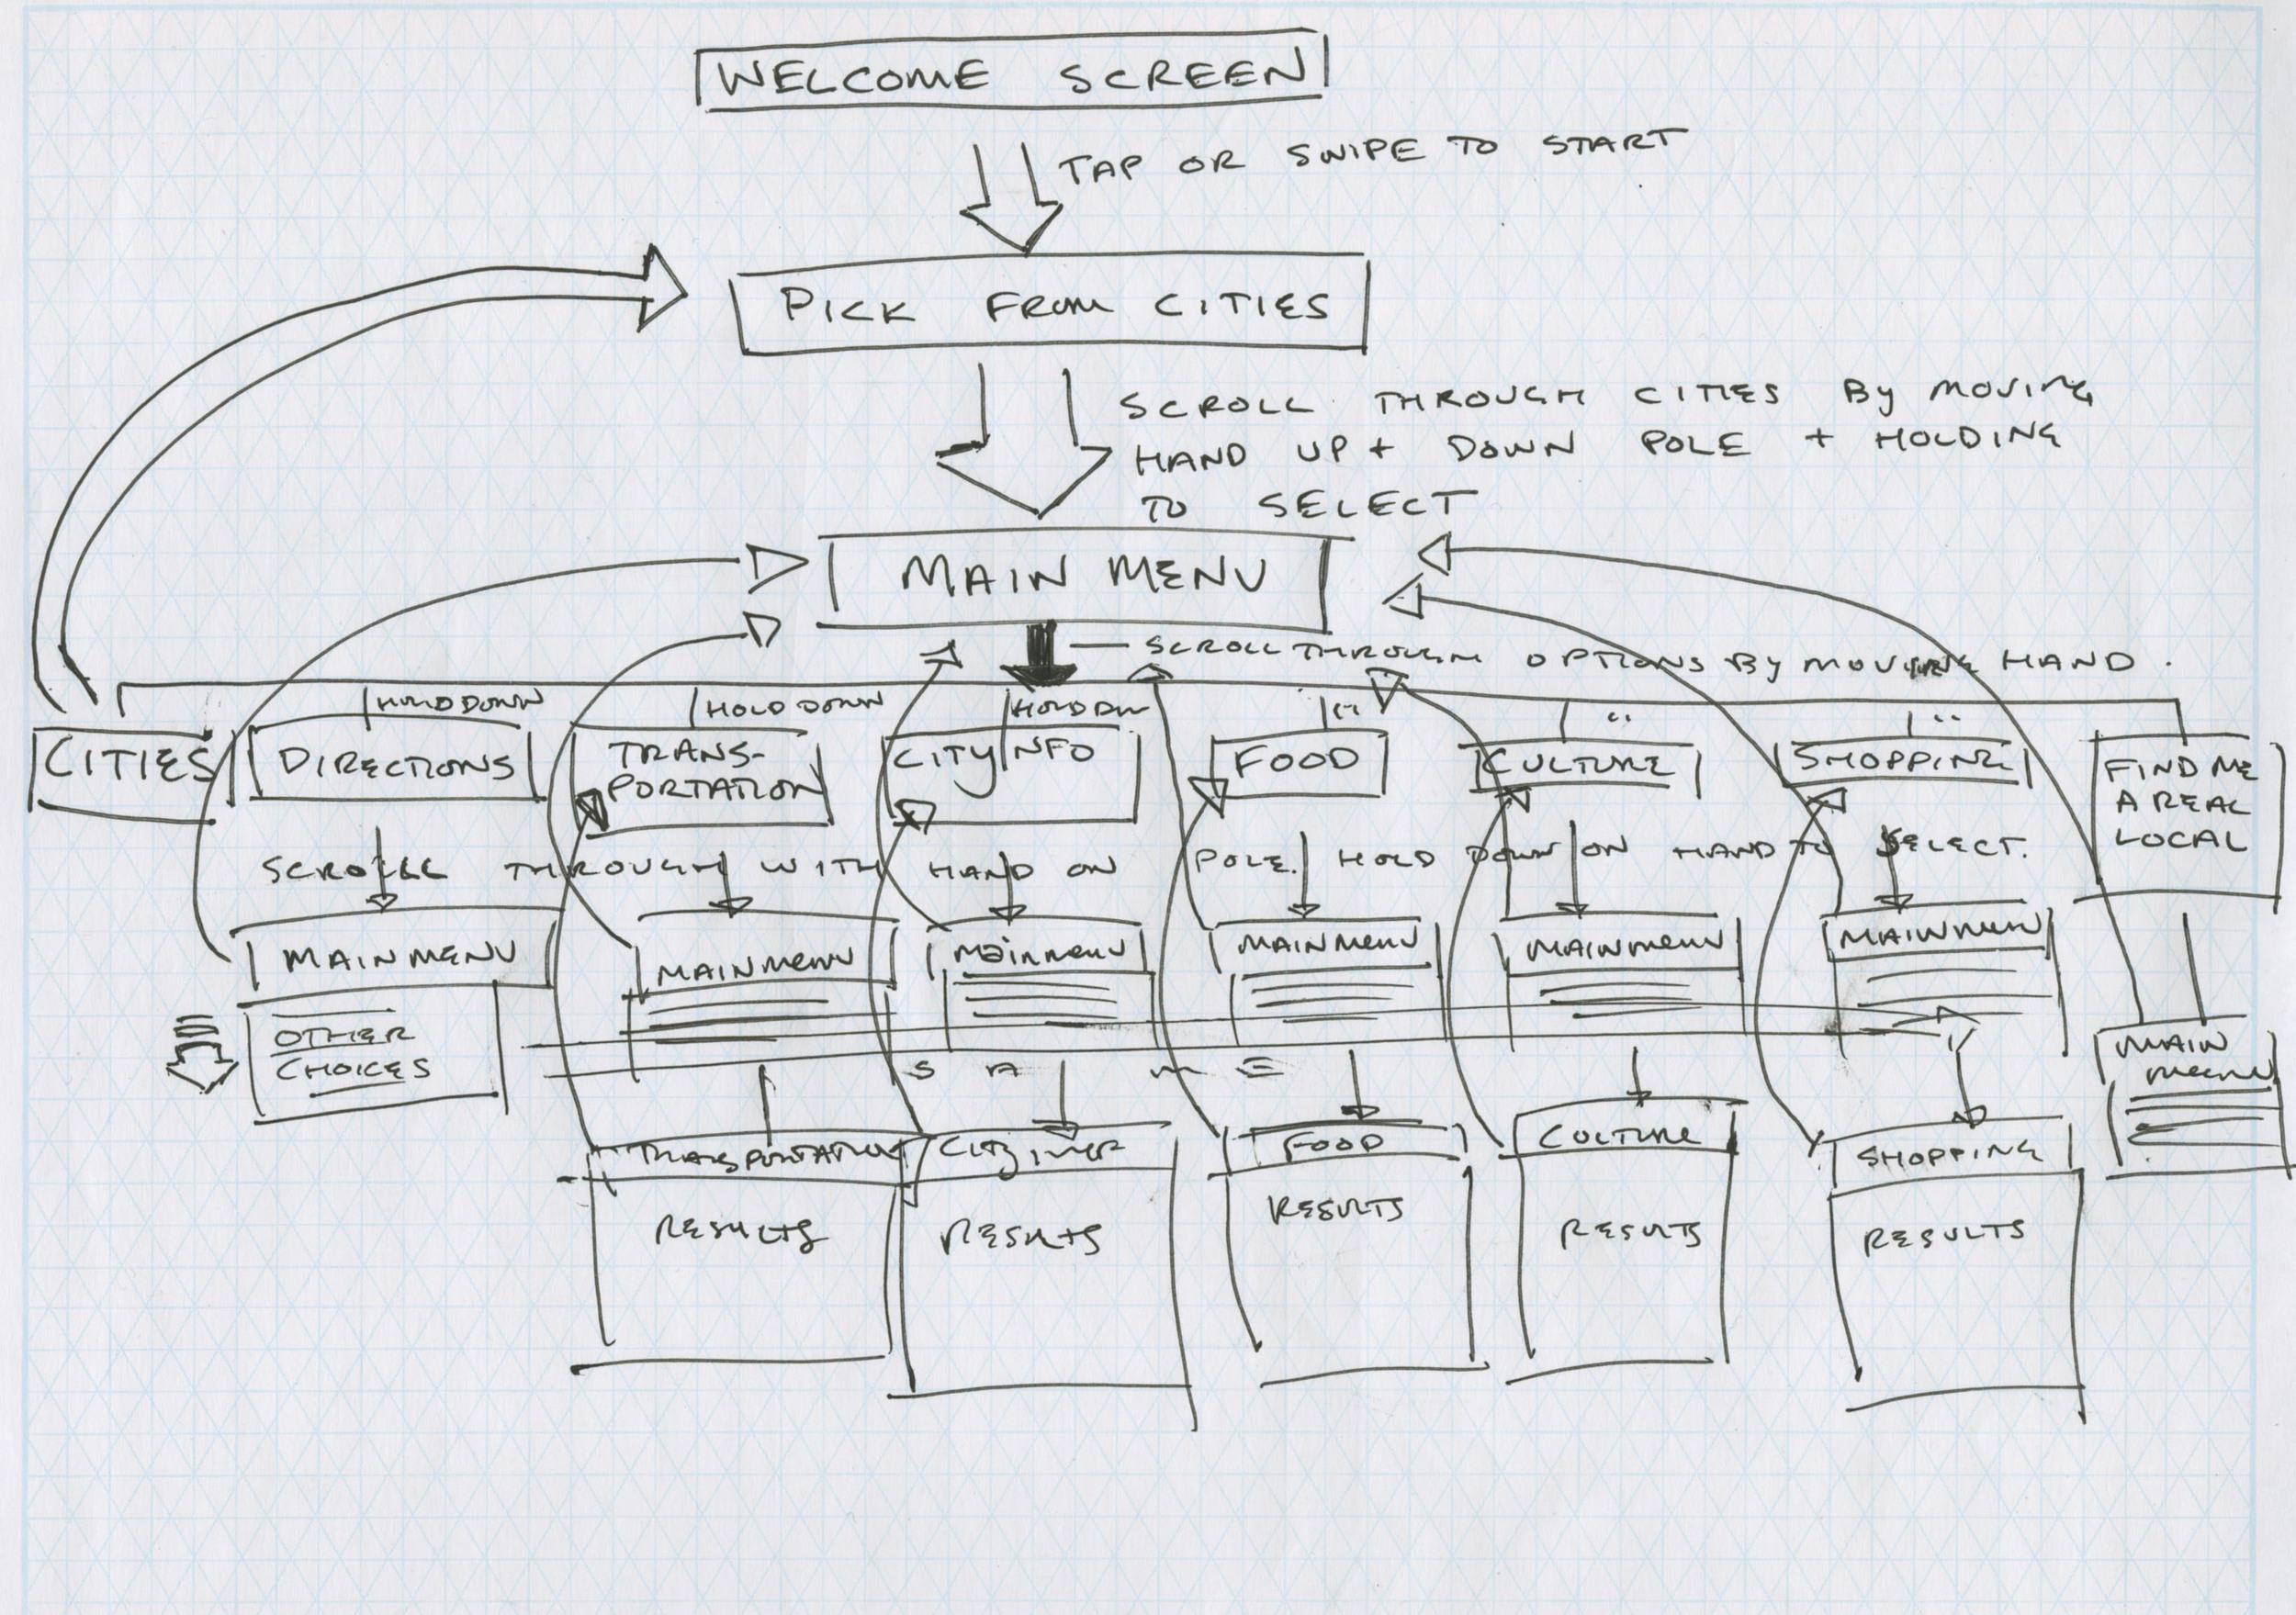 lena_problem2_sketch6.jpg